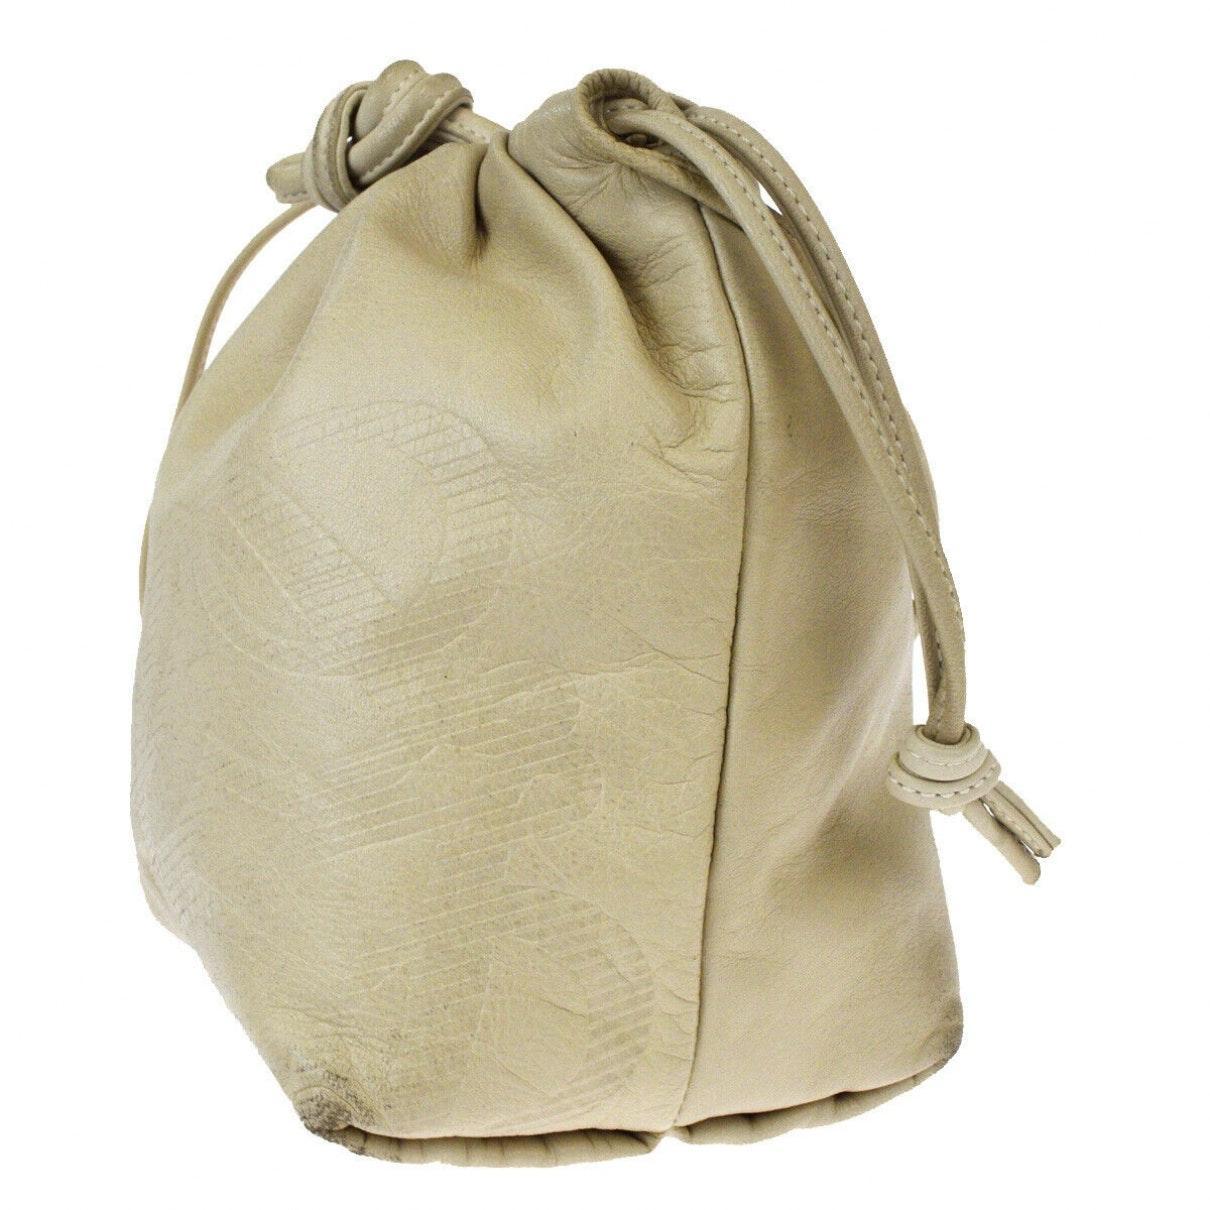 Loewe Leder Handtaschen in Blau Wp87Z